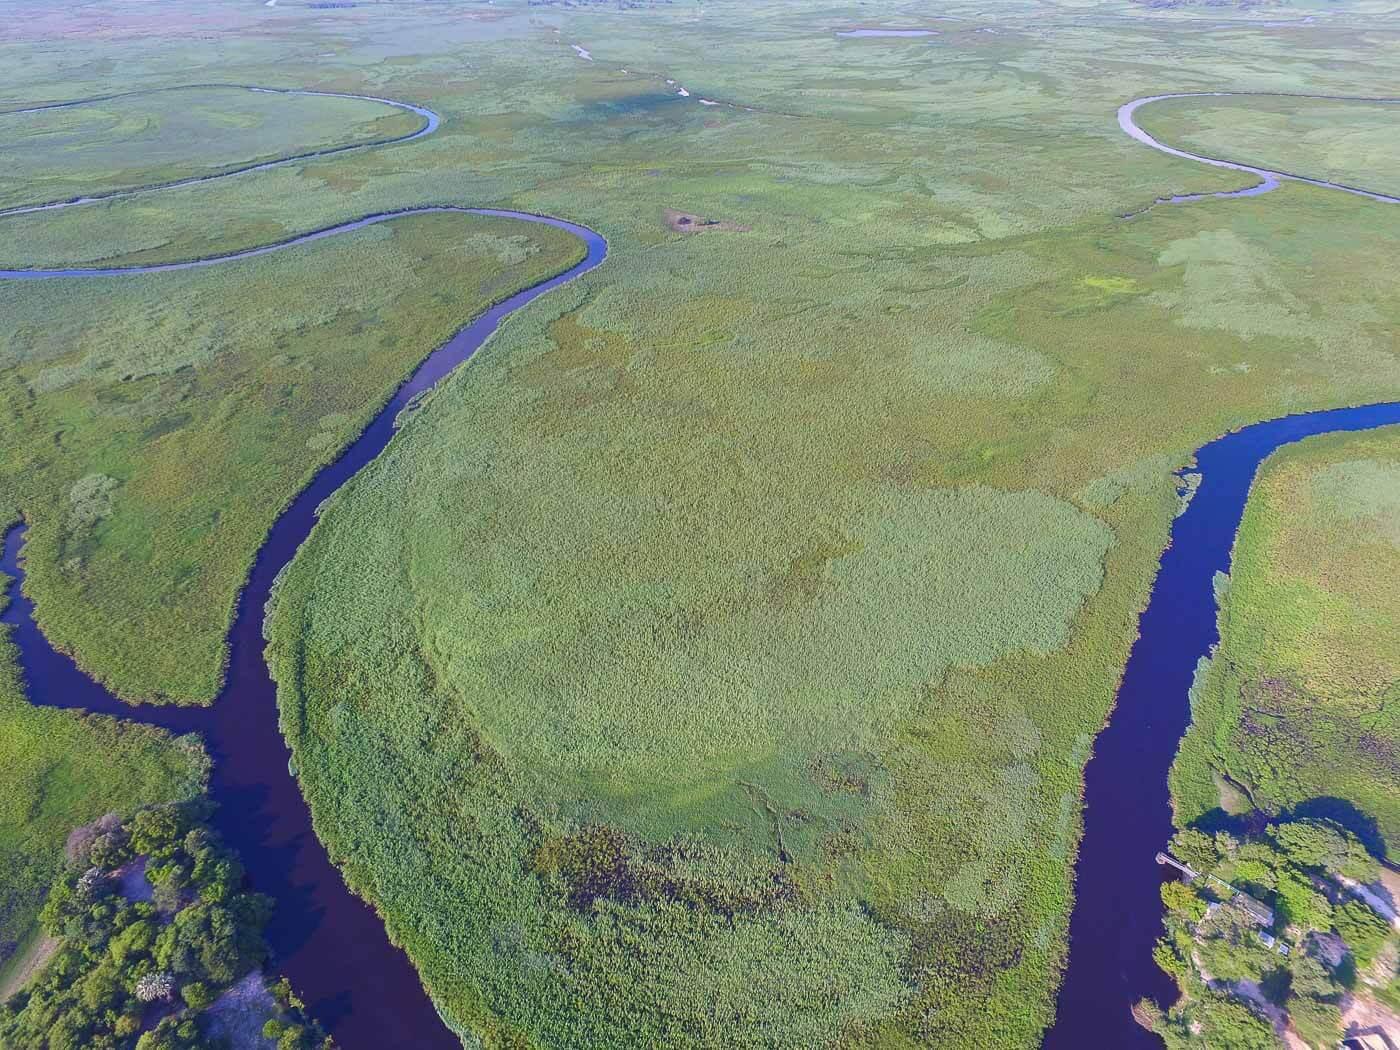 Tudo sobre Botsuana - Rio Okawango